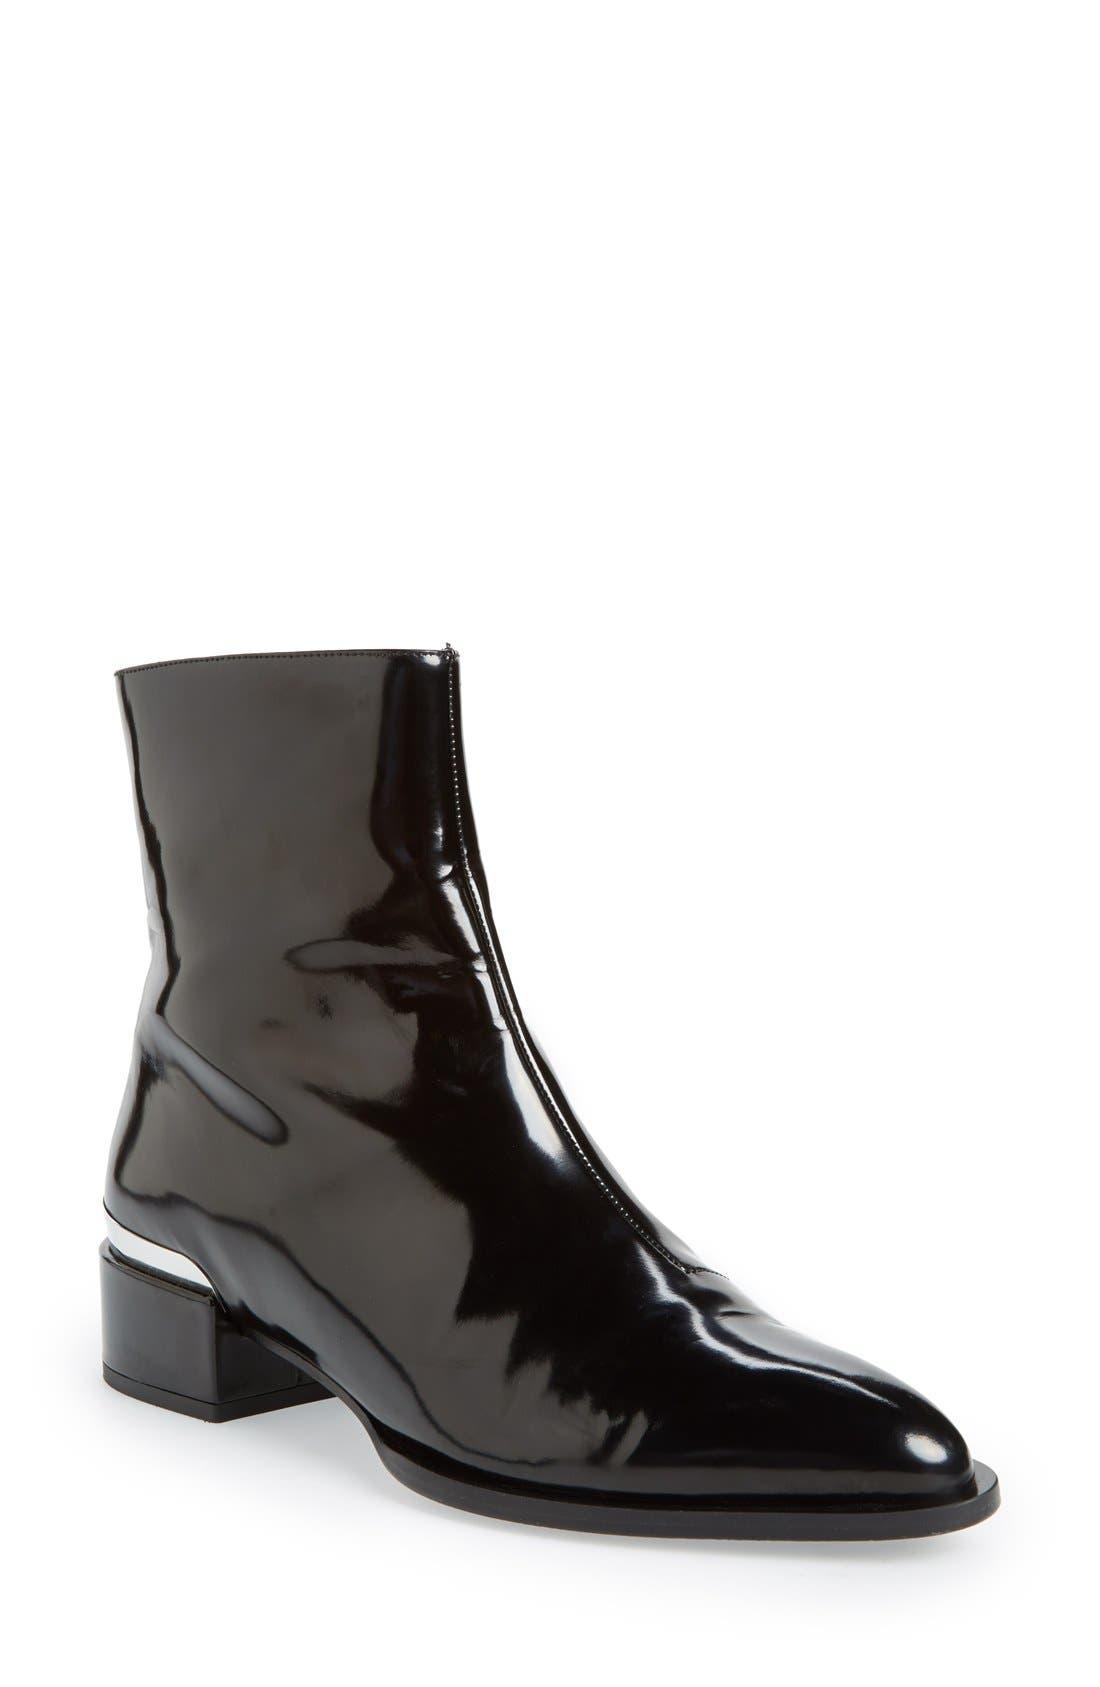 Main Image - Vince 'Yasmin' Pointy Toe Boot (Women)